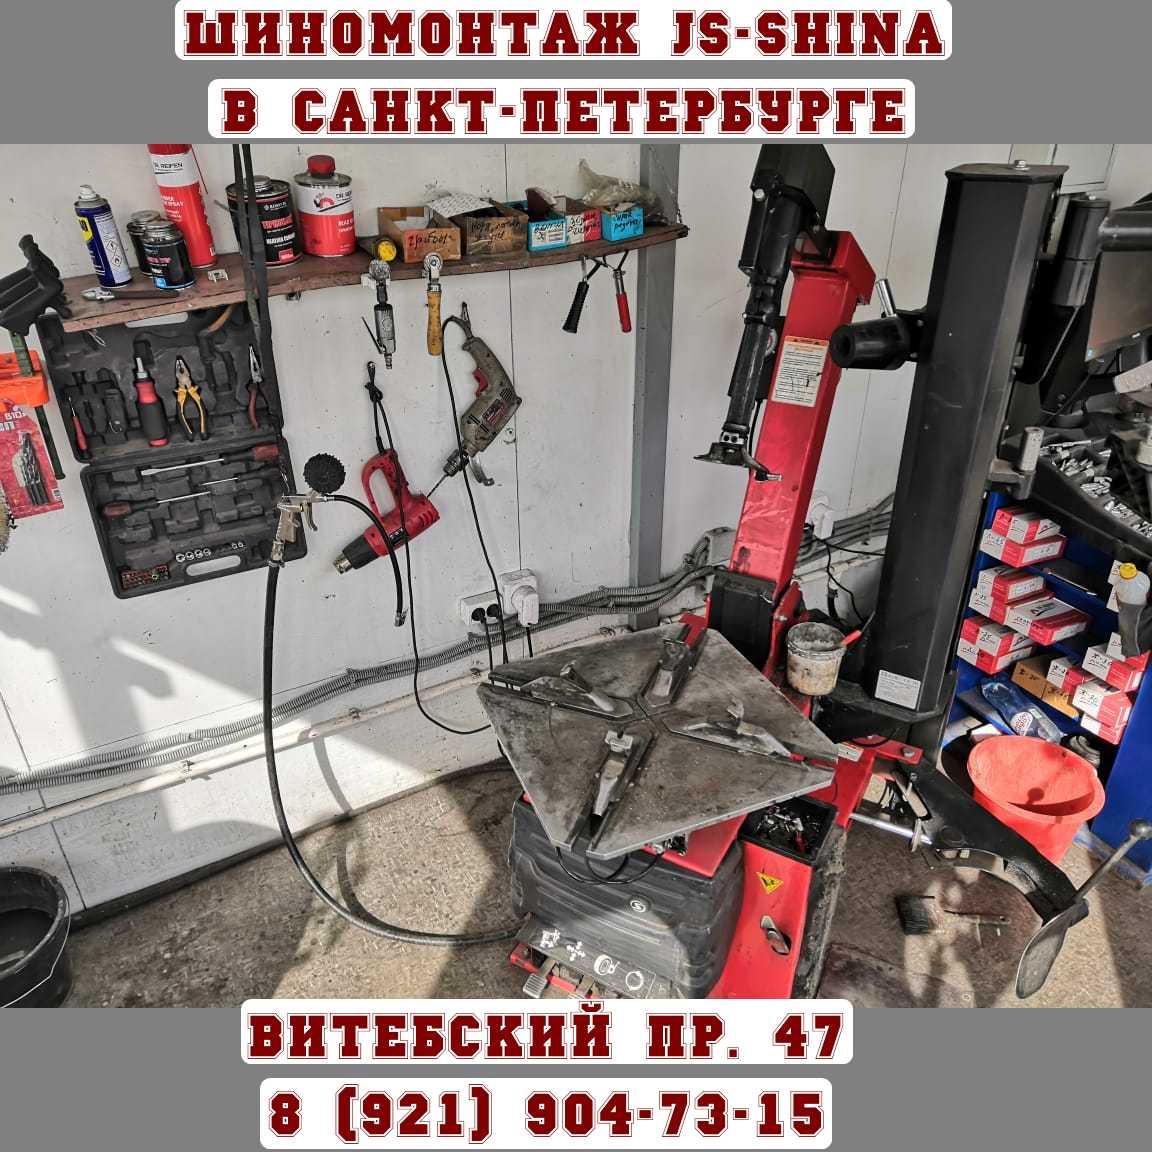 JS-Shina шиномонтаж 24 часа в Санкт-Петербурге Витебский пр. 47 Мастер: 8 (921) 904-73-15